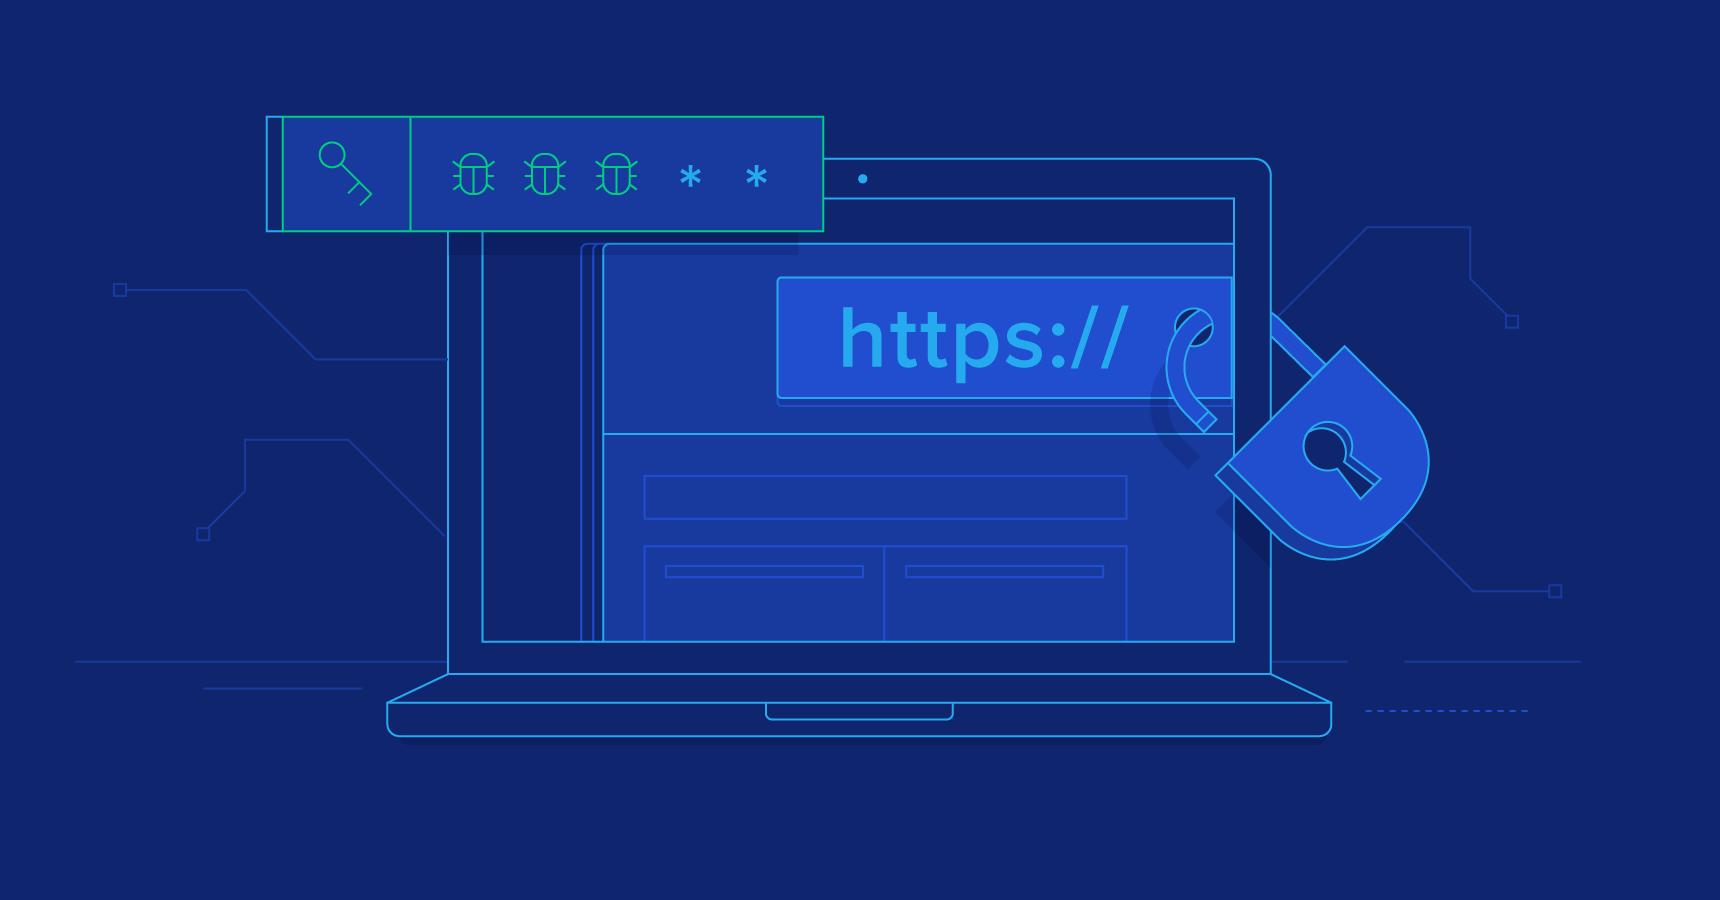 Lesmateriaal Webapplicatie Beveiliging - Serverbeheer